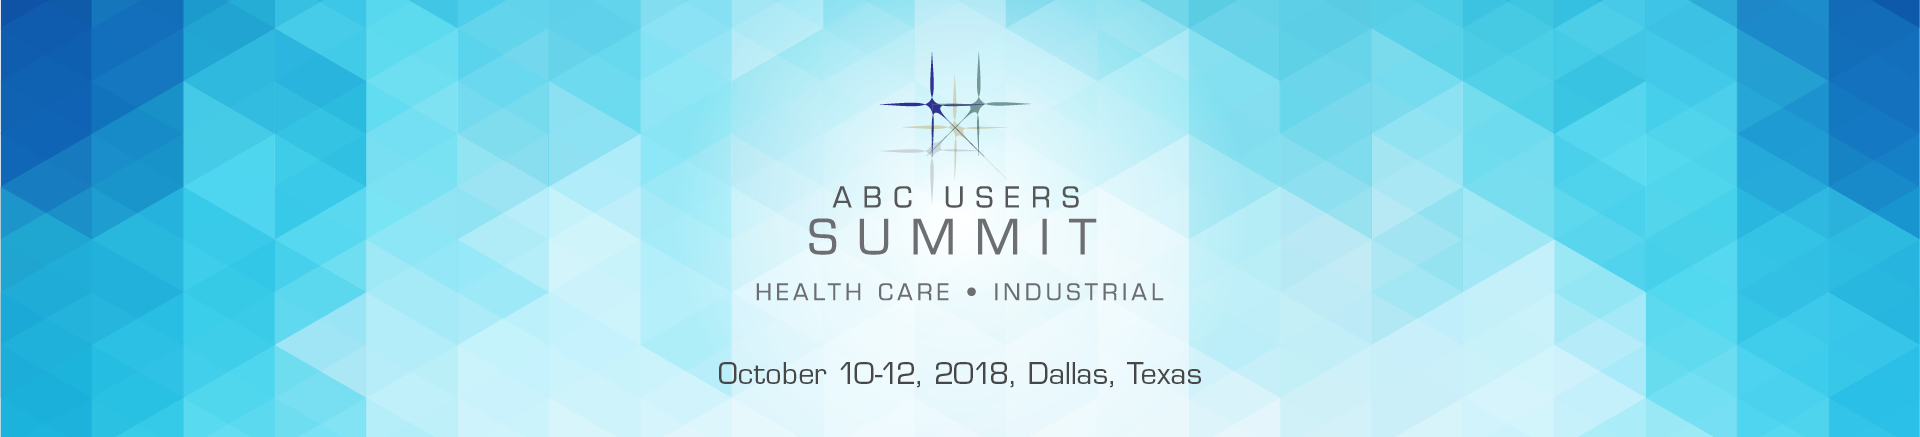 2018 ABC Users Summit